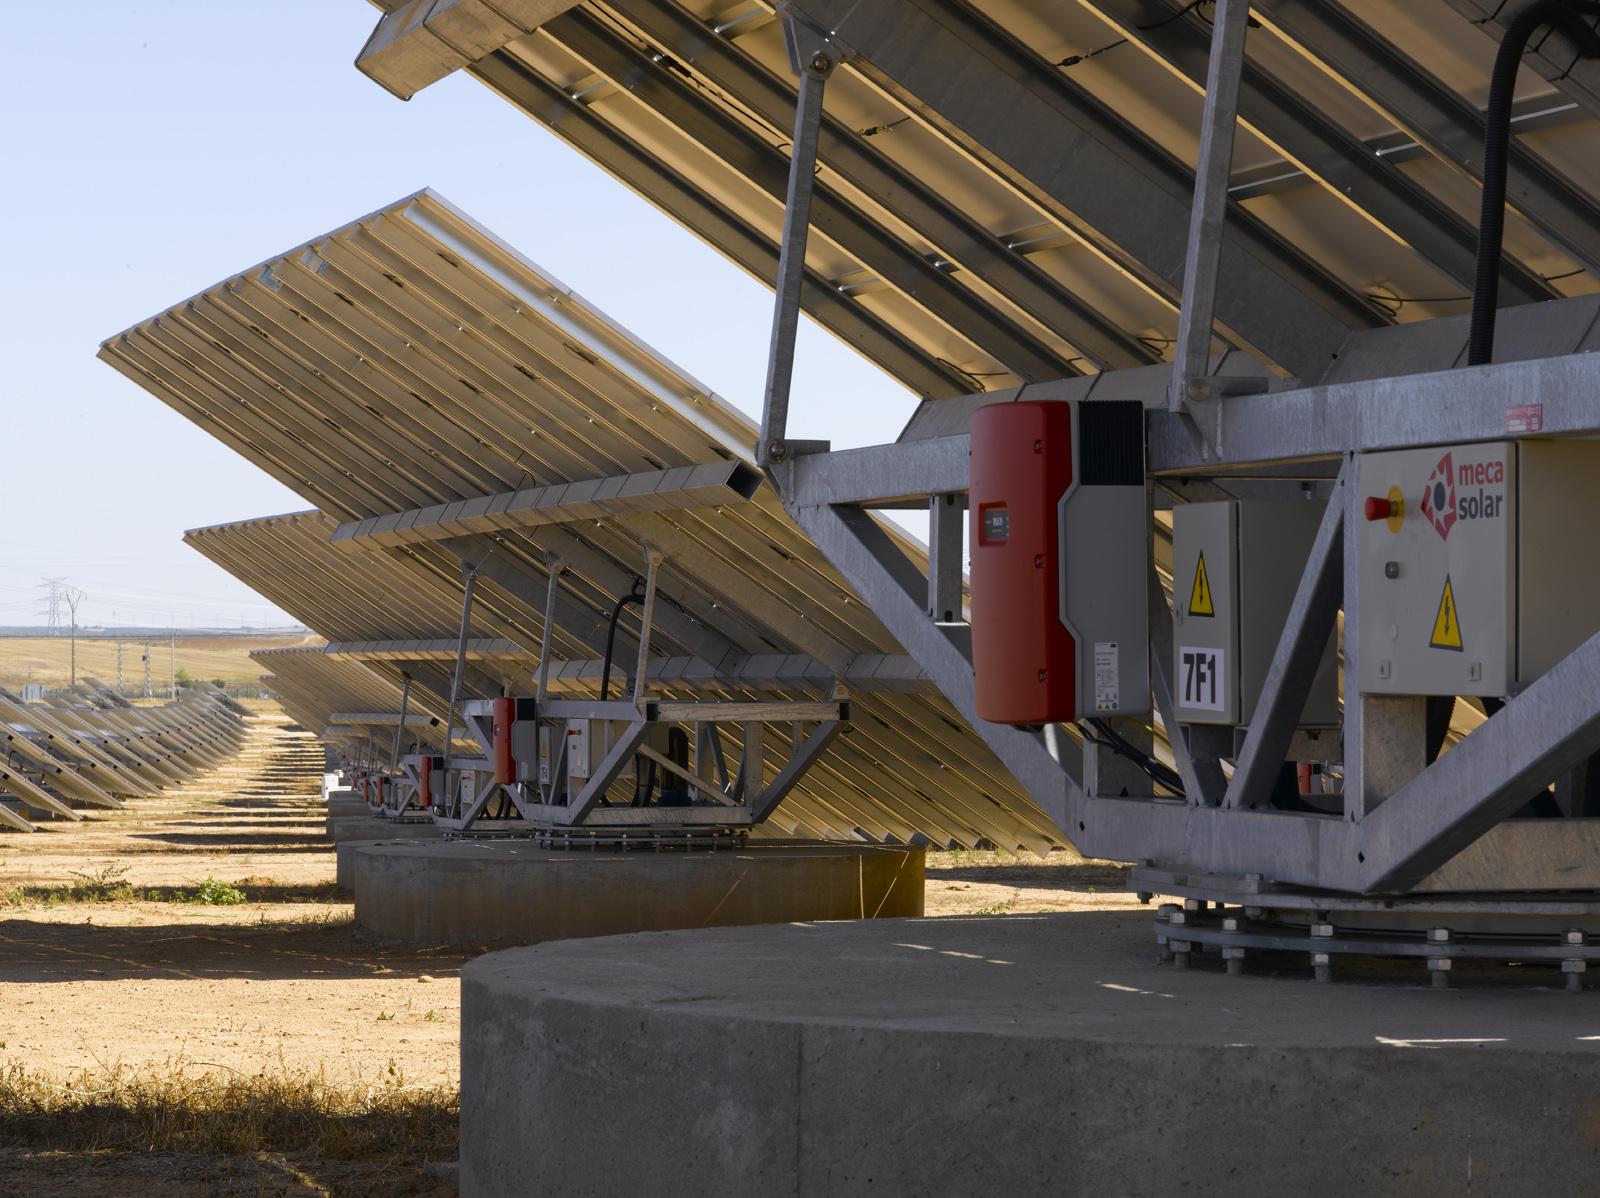 MECASOLAR suministrará seguidores para una central de energía solar fotovoltaica